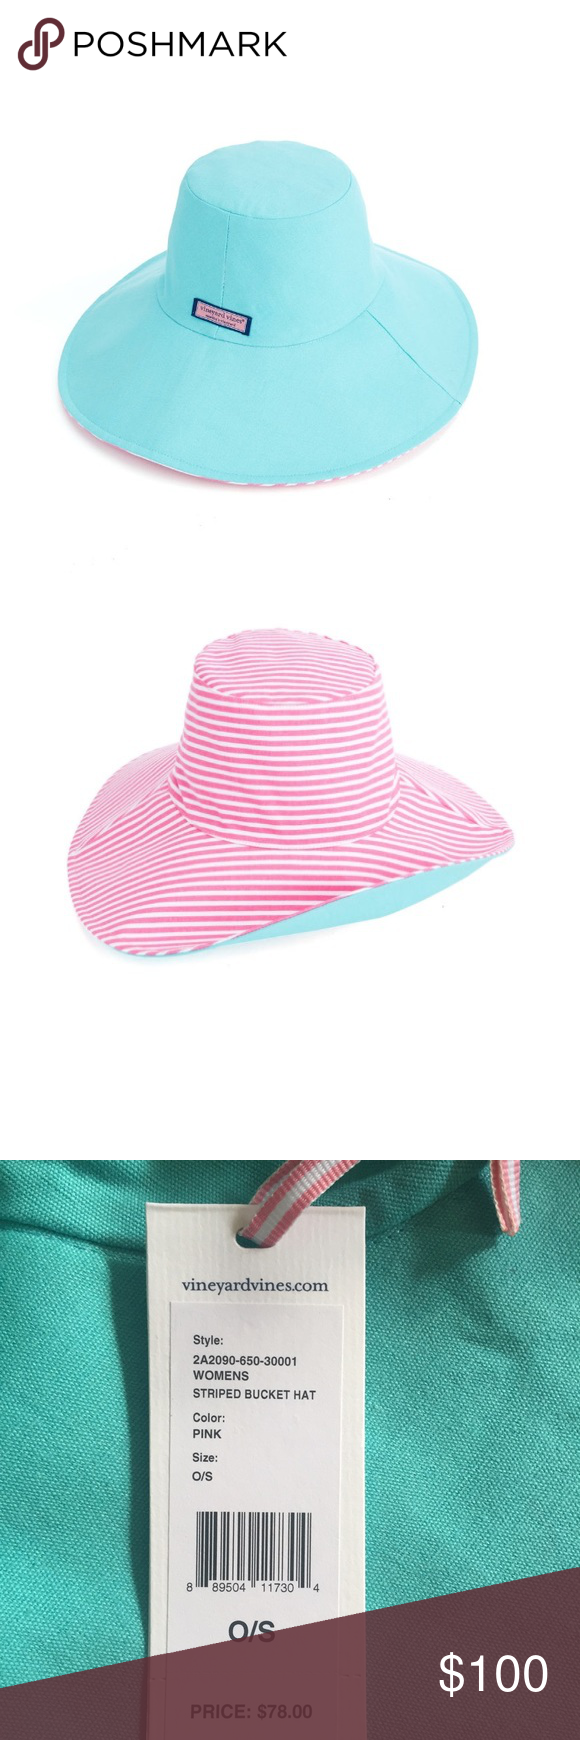 Vineyard Vines Reversible Bucket Hat Great gift idea!!! Vineyard Vines  Bucket Hat ef4457789c2